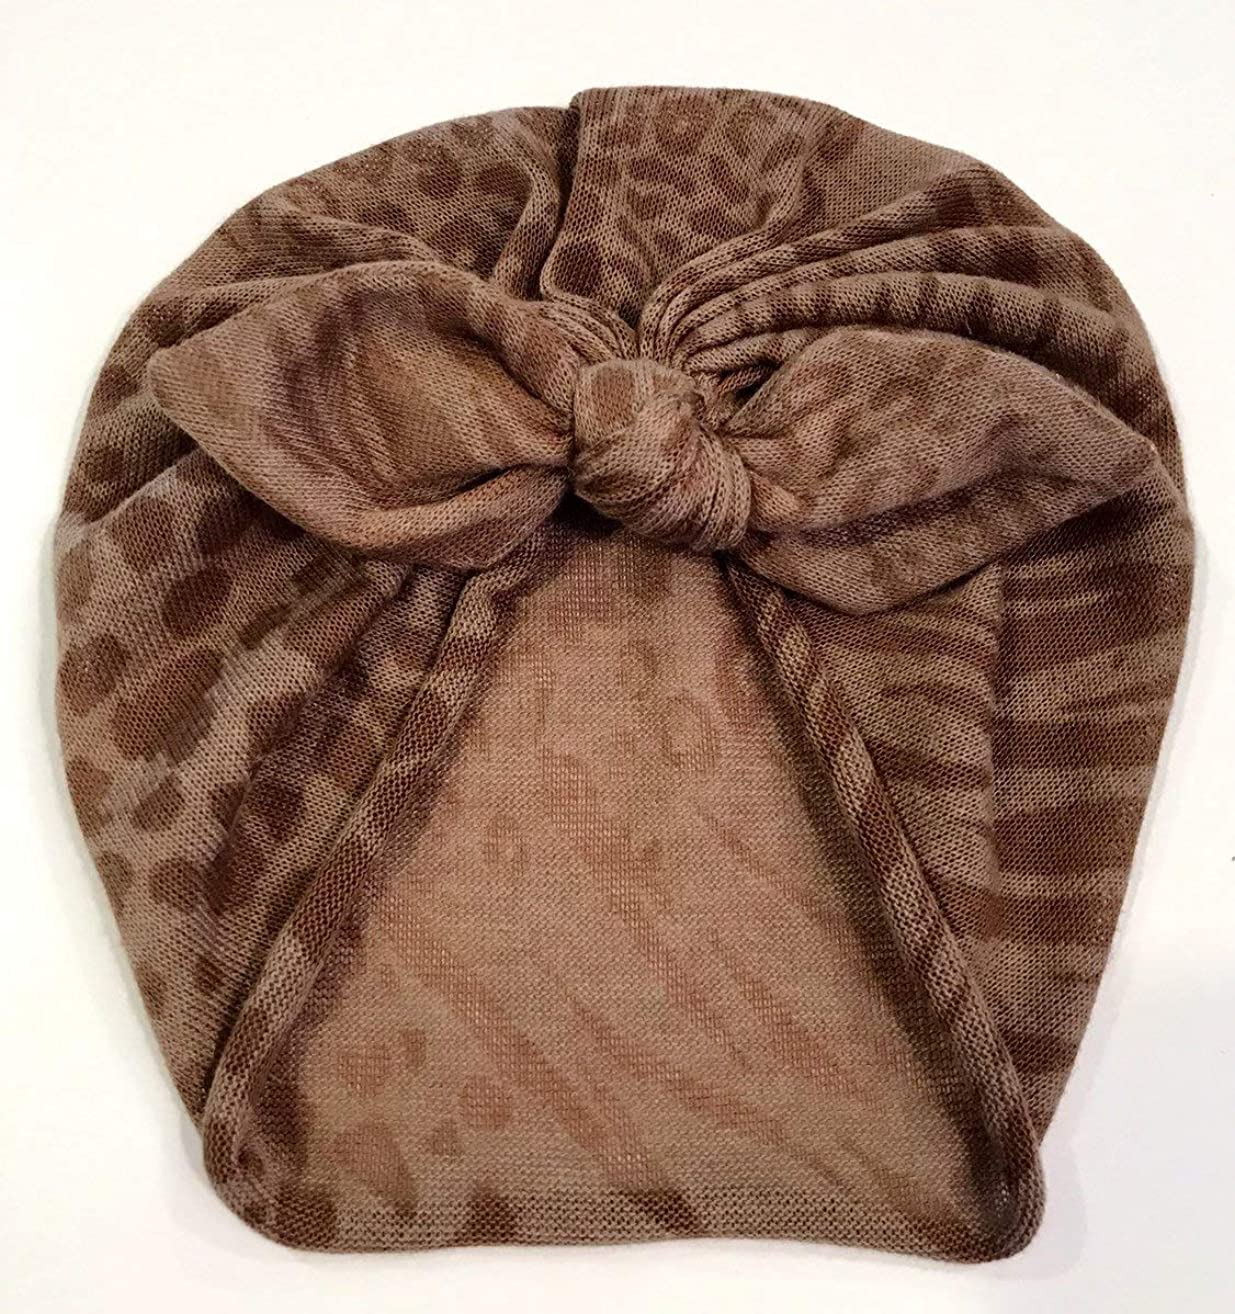 Bunny Ear Headwrap Animal Print| Baby Turban|Adult Turban|Top Knot Turban|Top Knot Baby Hat|Kids Turbans|Toddler Turban|Bun Turban|Newborn Turban